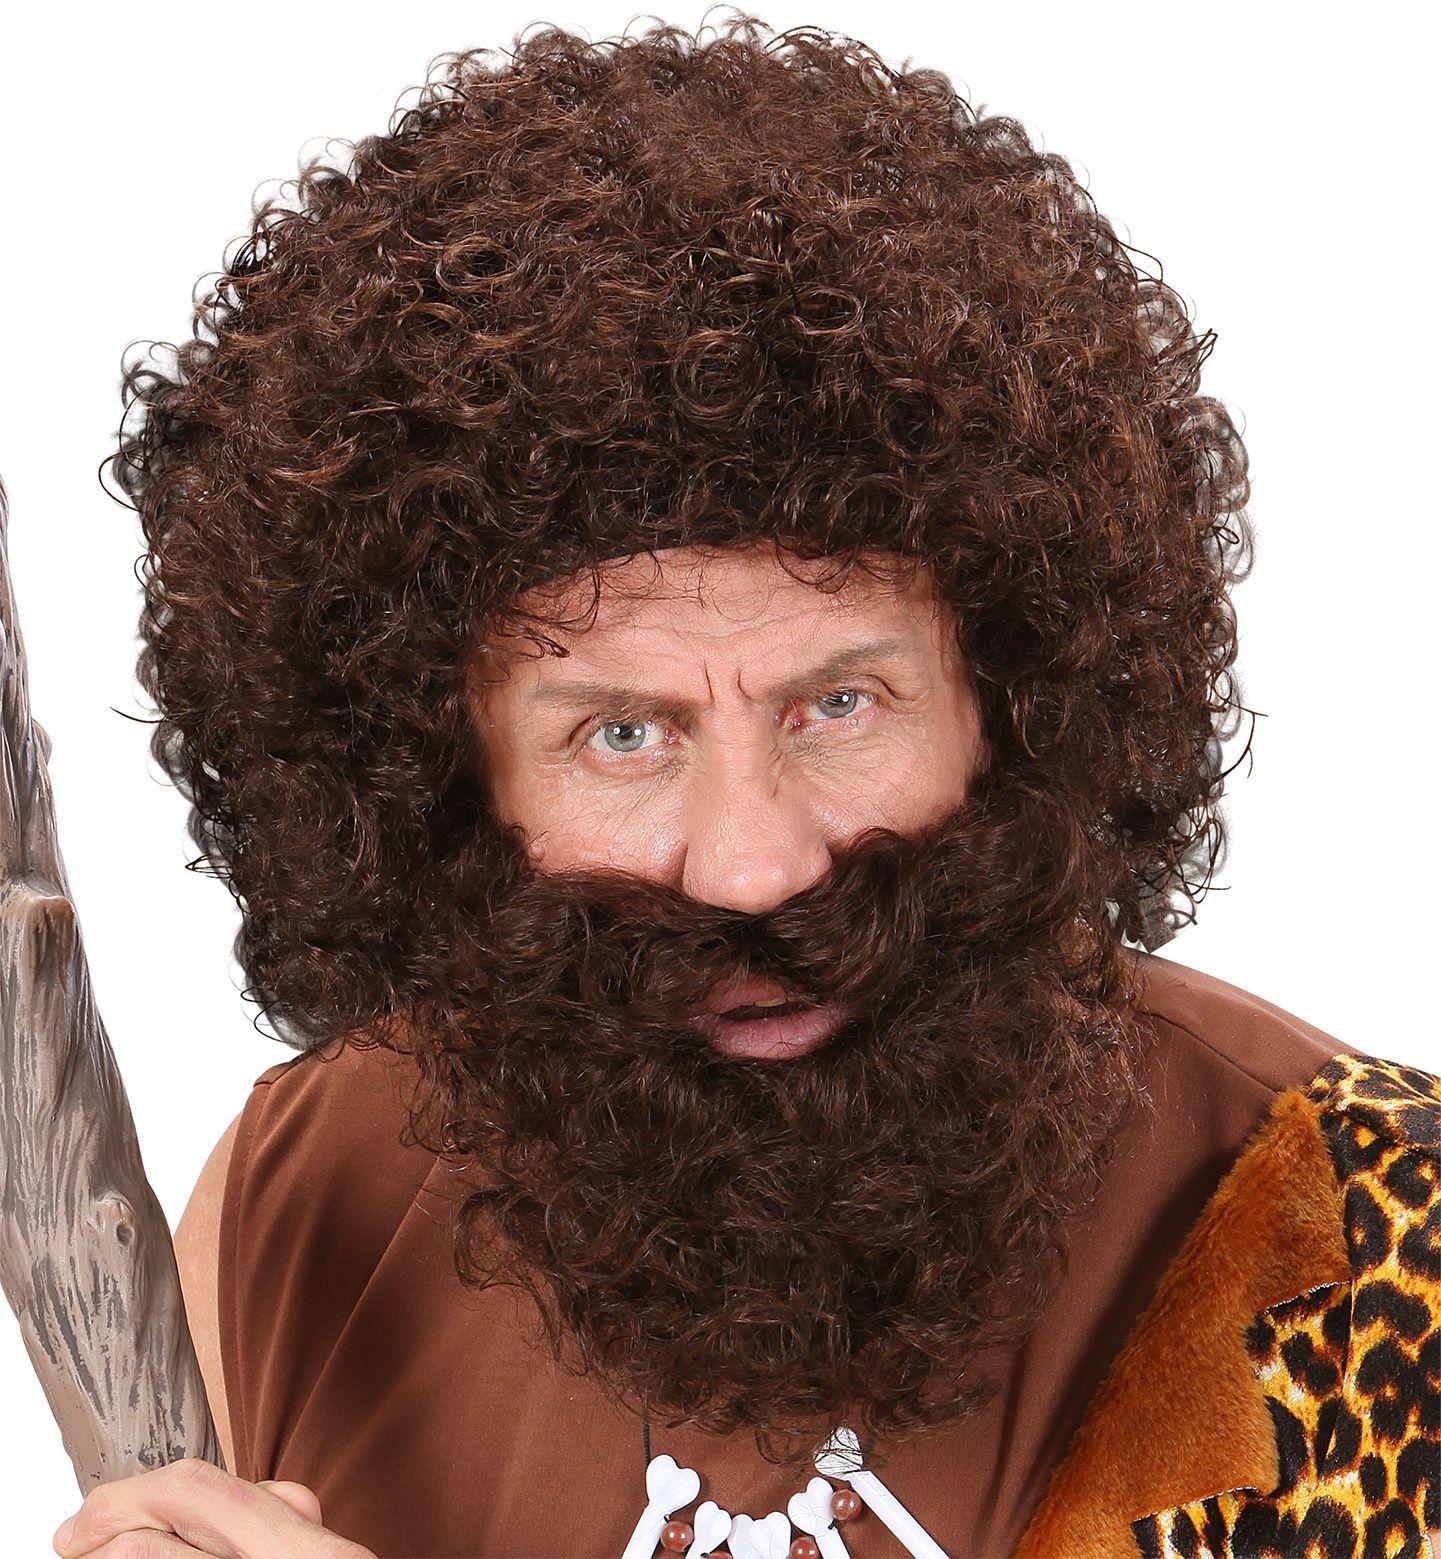 Bruine pruik met baard en snor